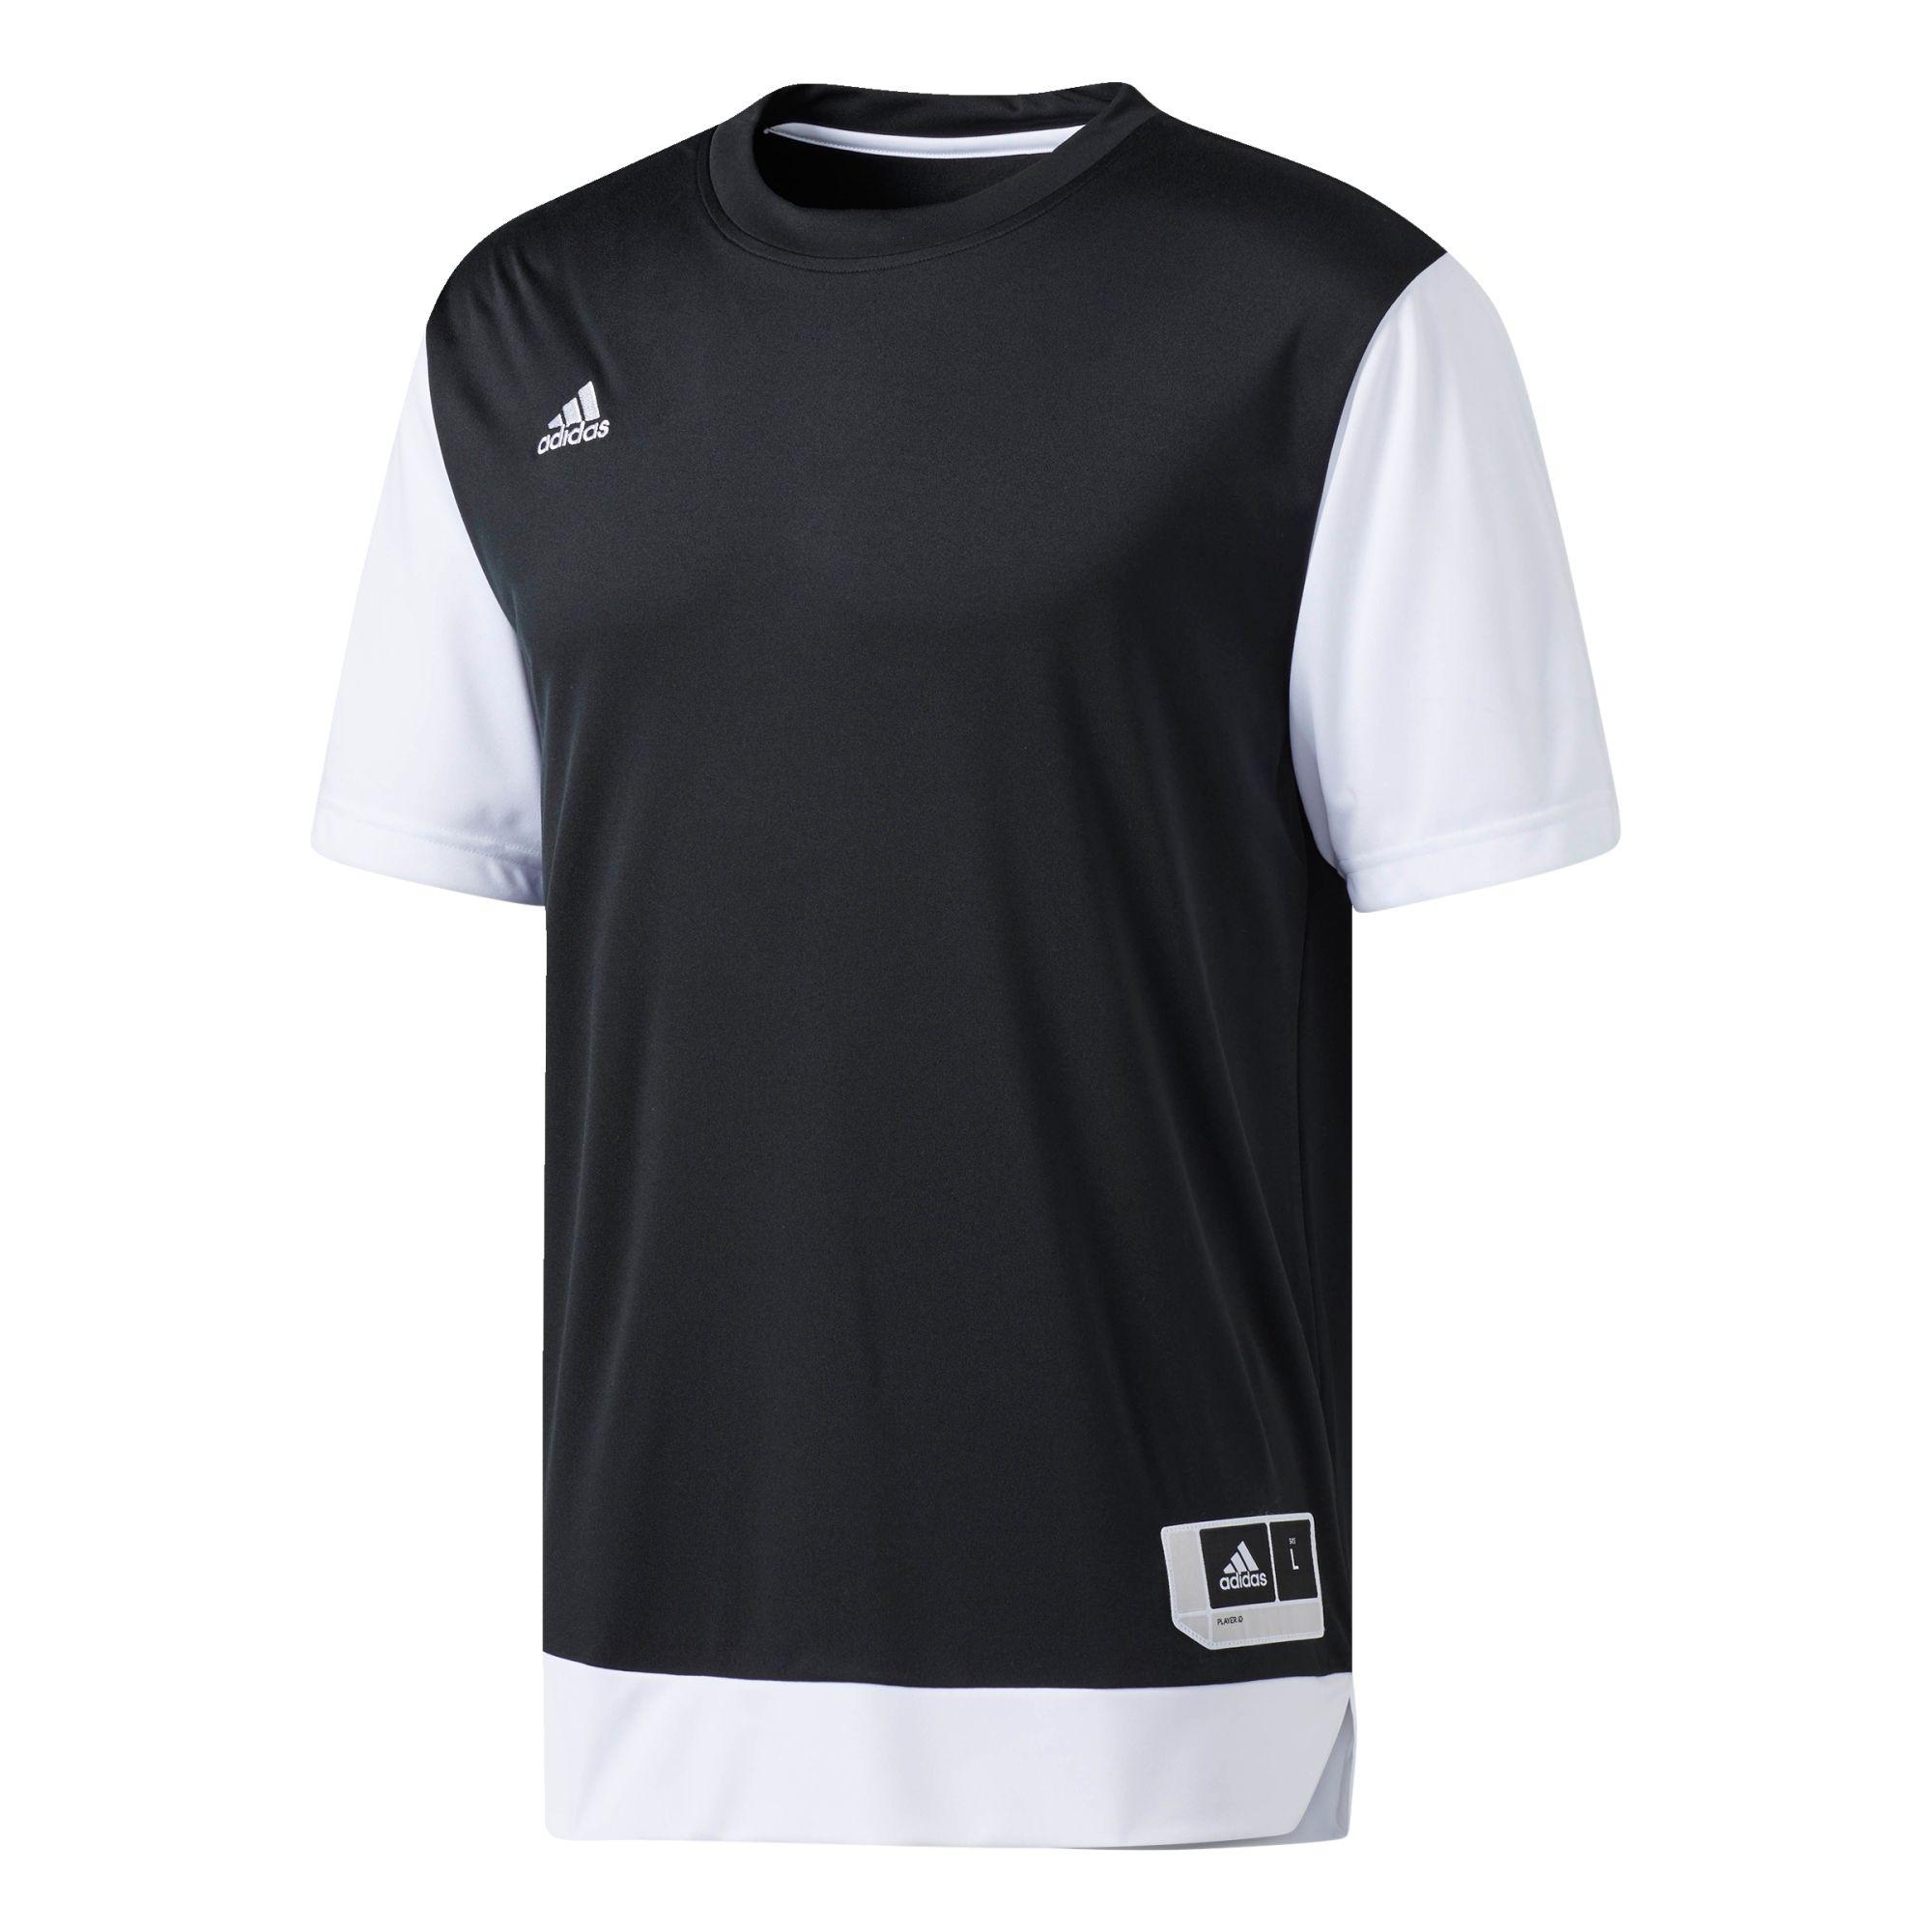 adidas Crzy Expl Shoot - black/white